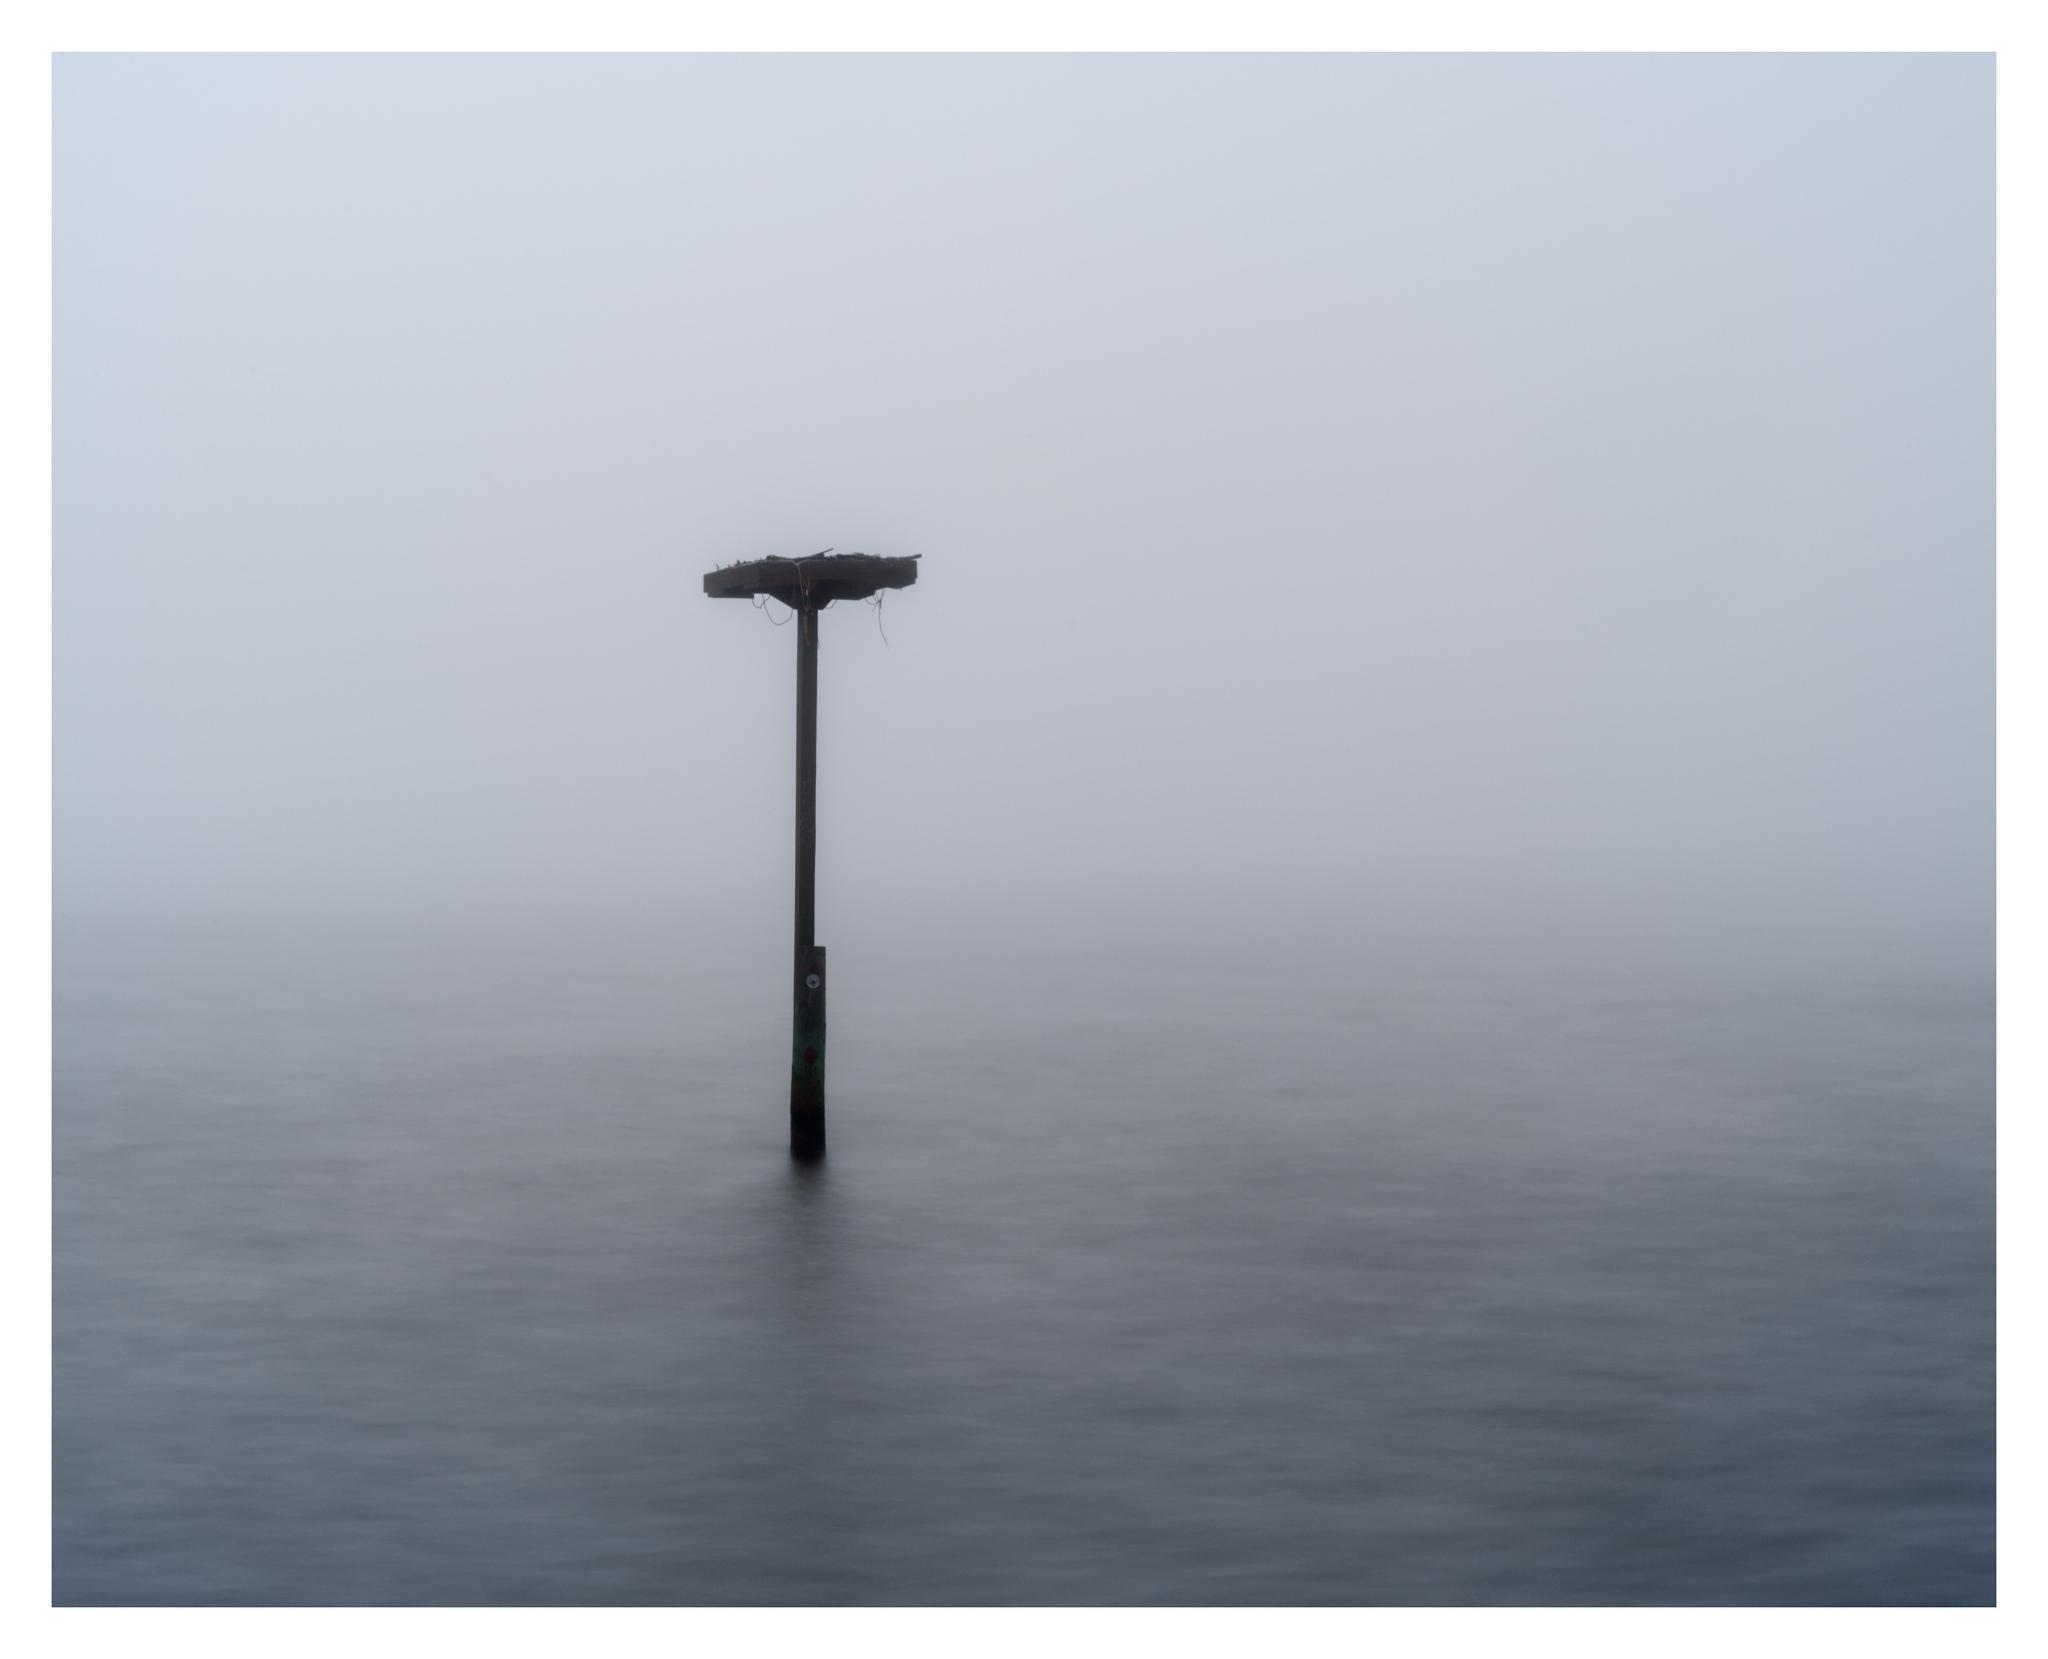 Osprey Nest Platform in the Fog - Nikon D750 w/80-400mm lens, long exposure